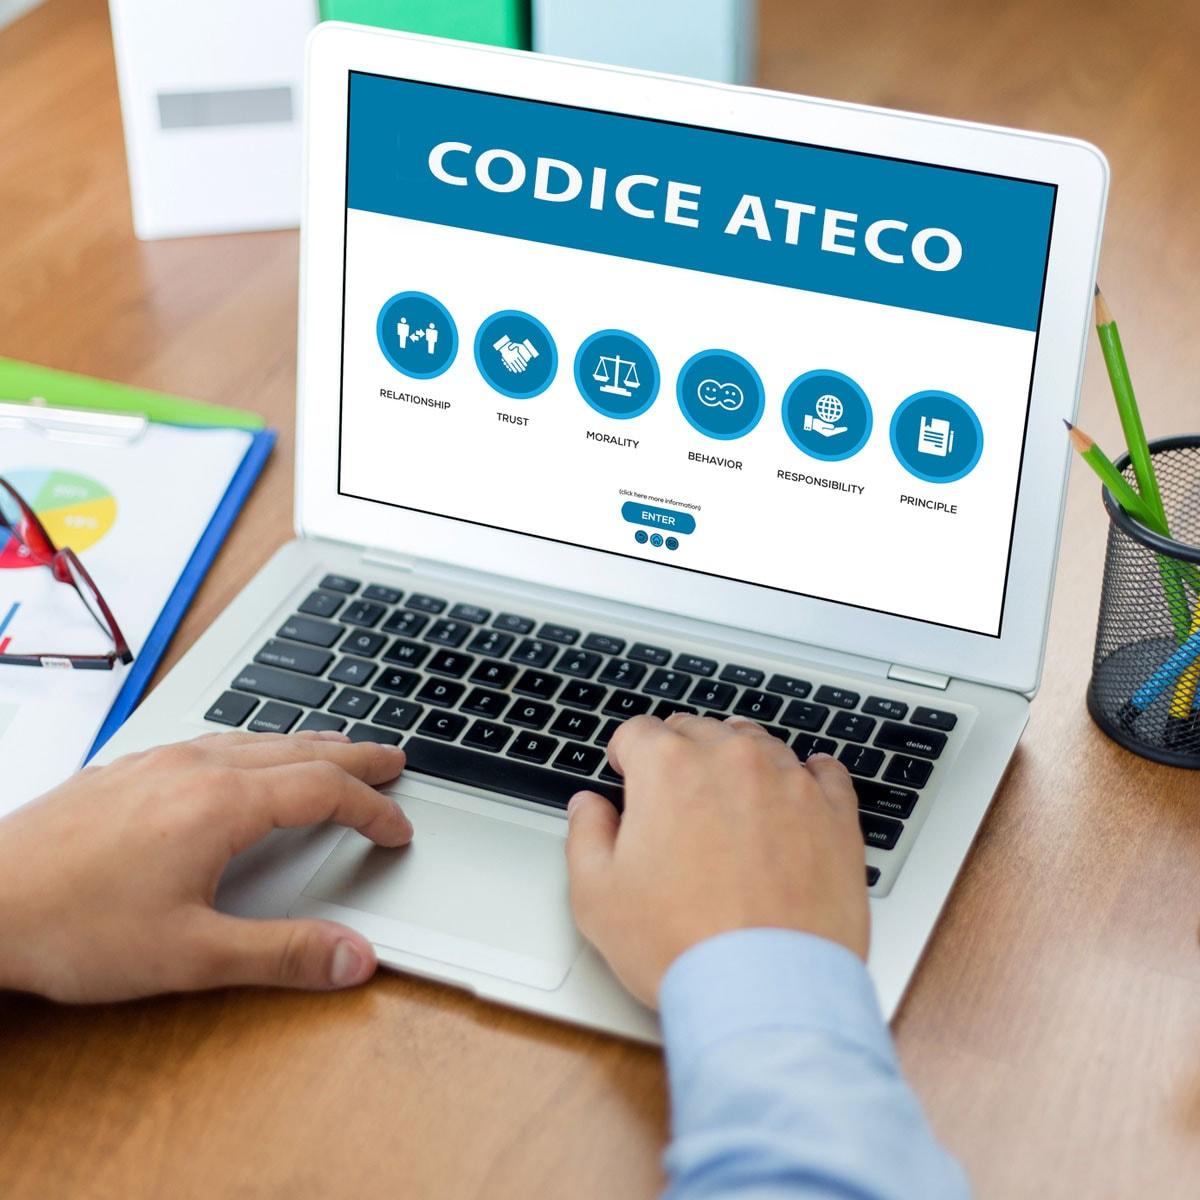 codice-ateco2